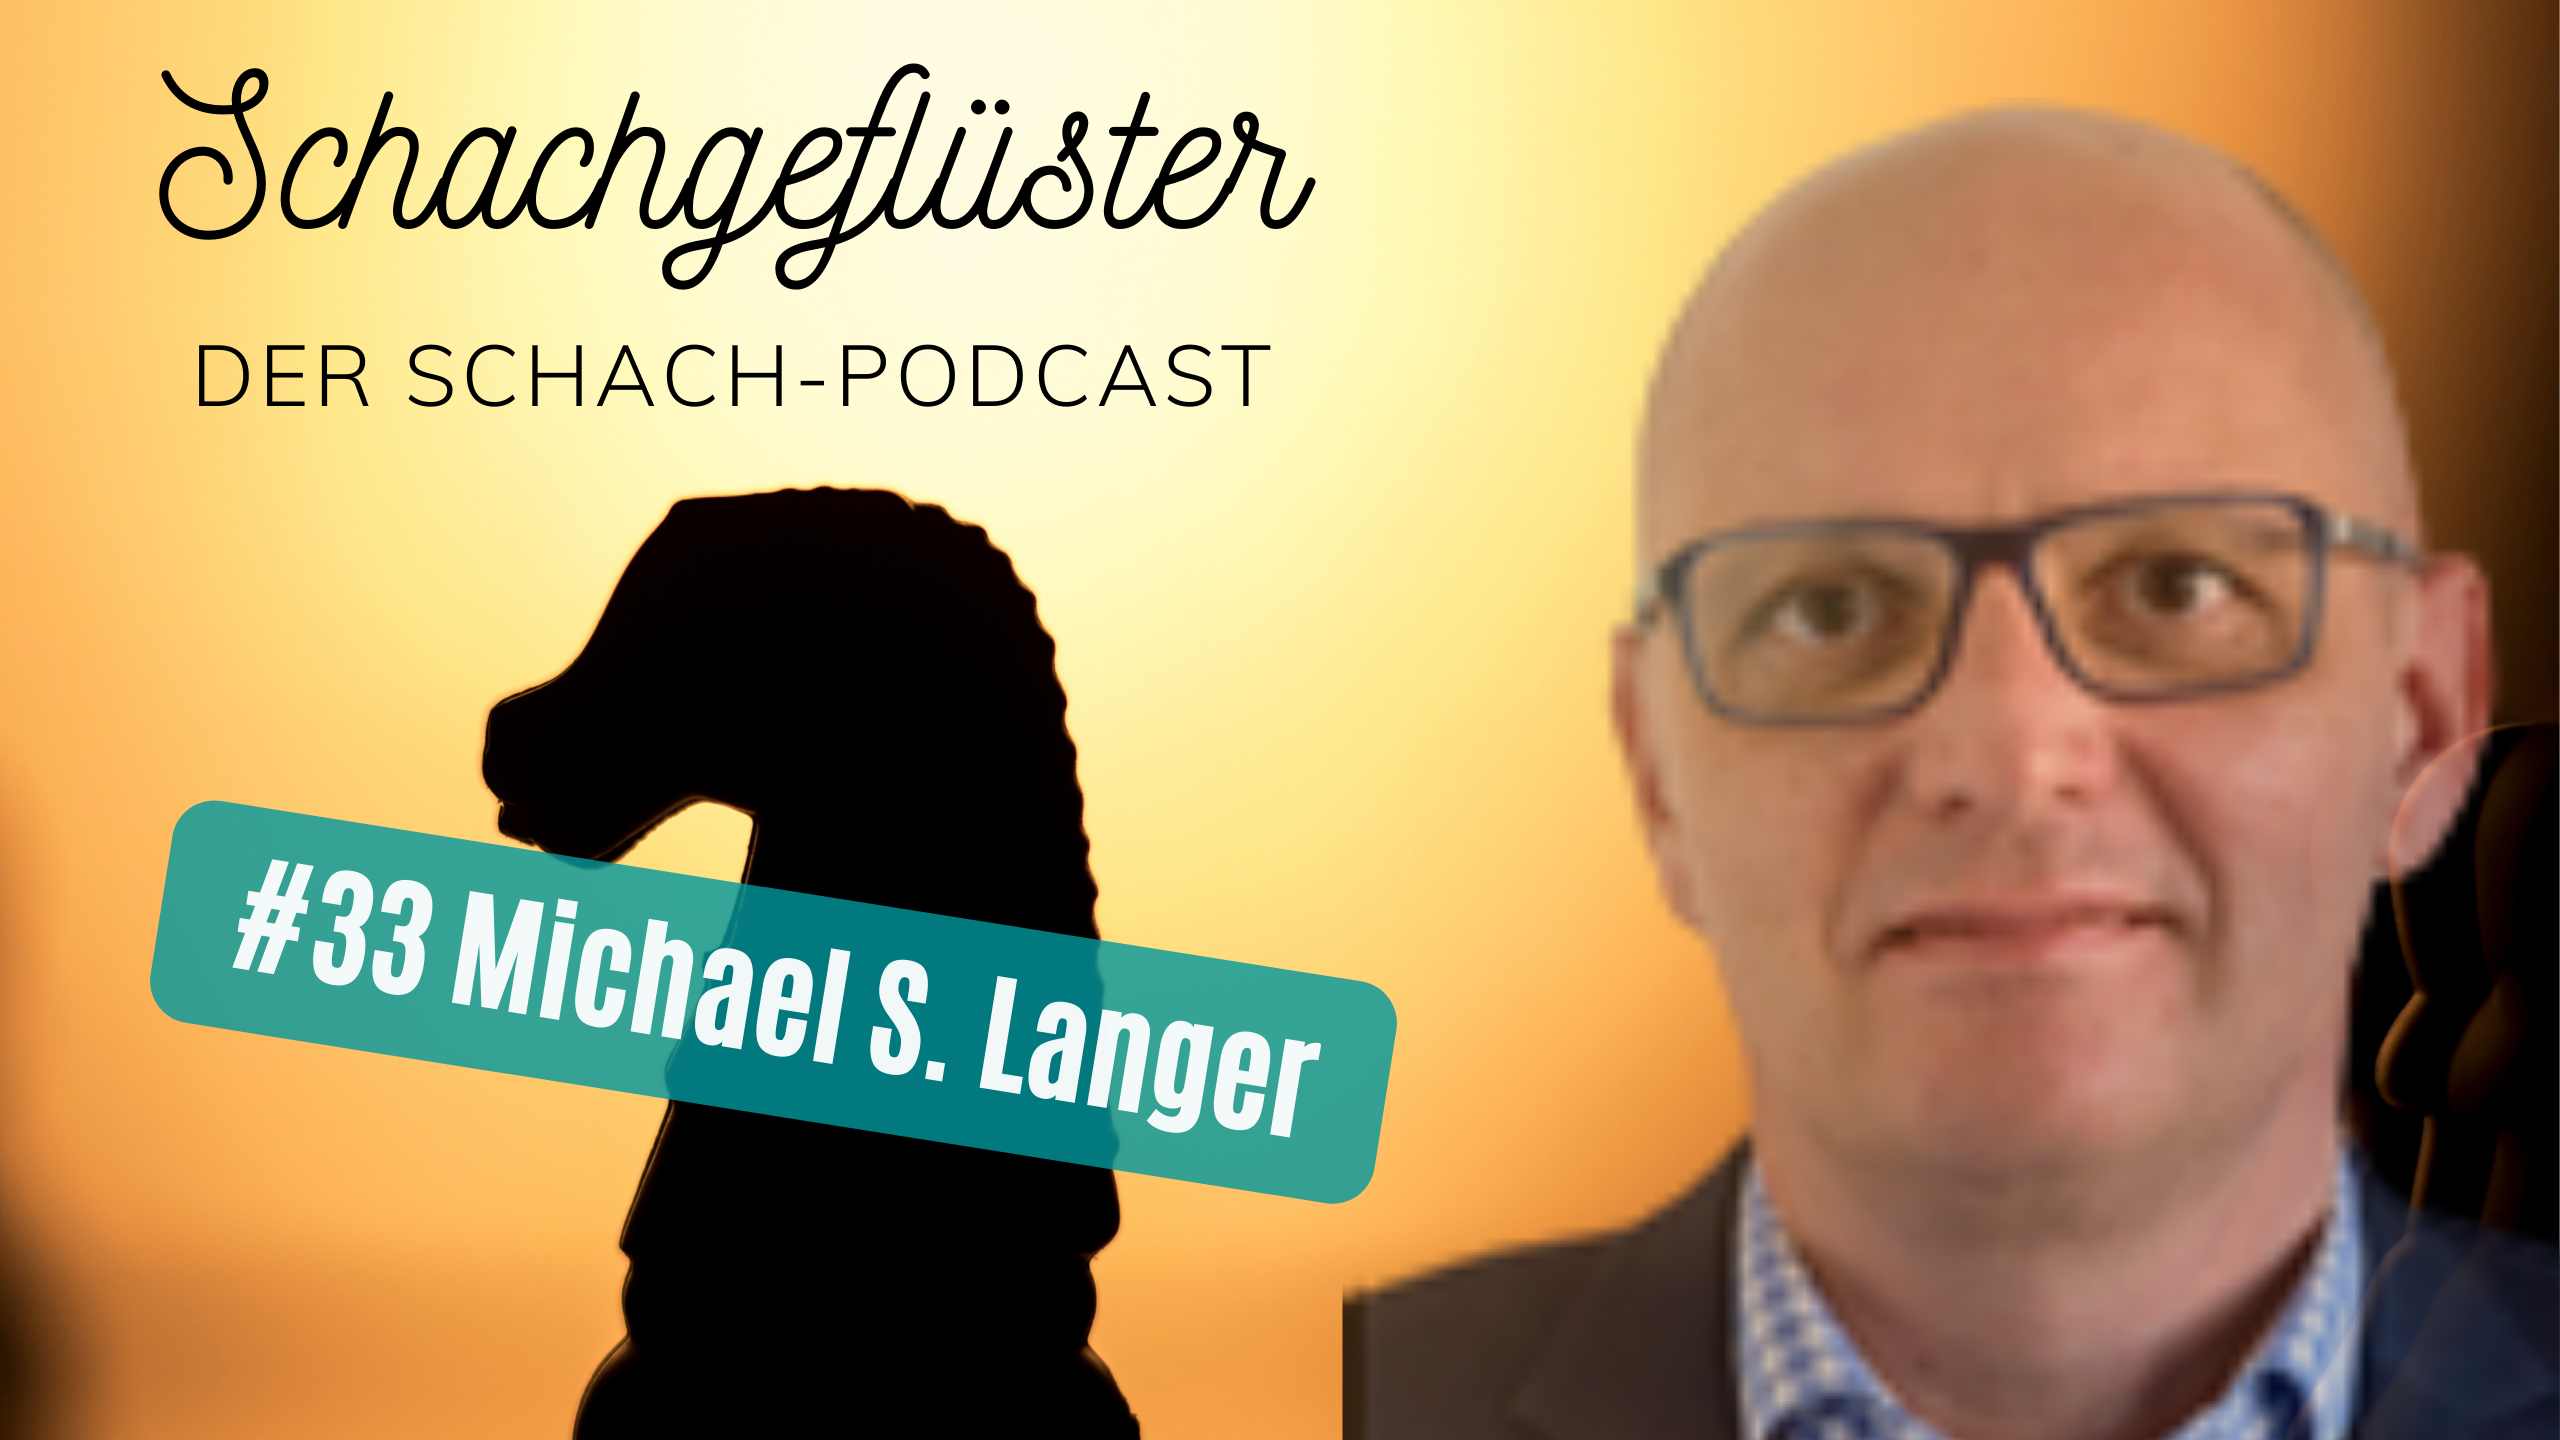 Der Schachpolitiker Michael S. Langer